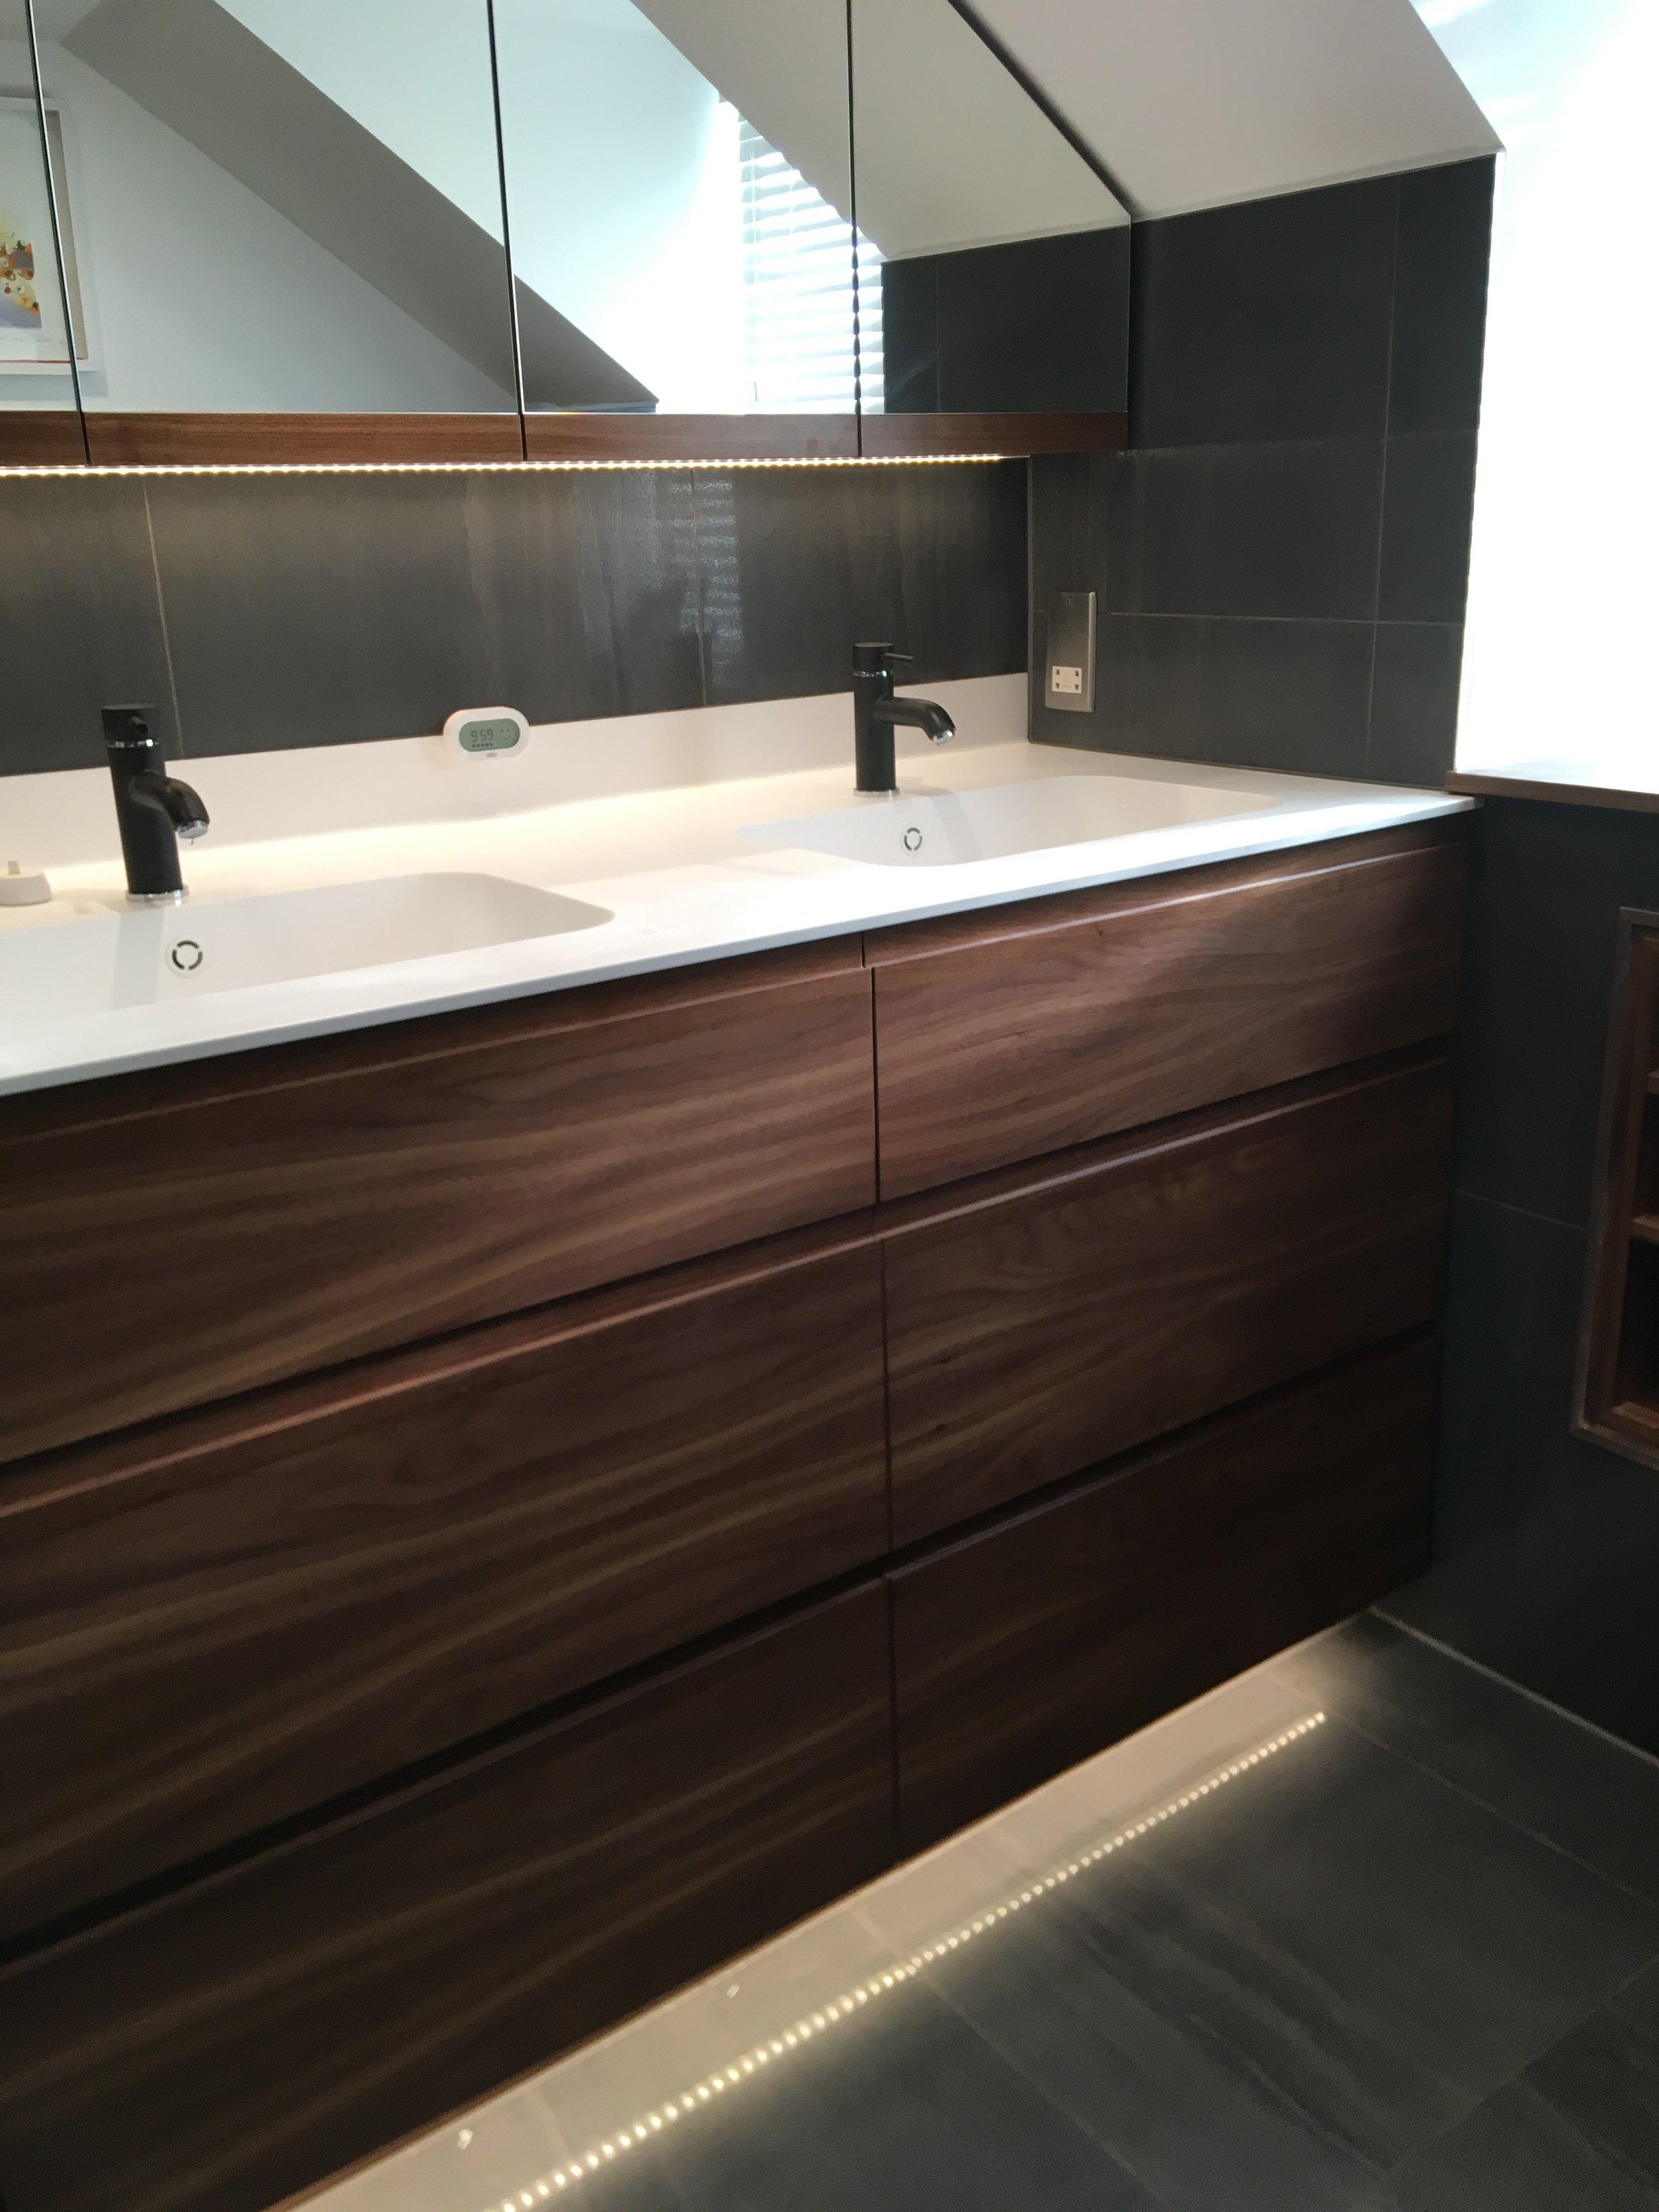 Grain_Bespoke_Furniture_Surrey_Bathroom_1.JPEG